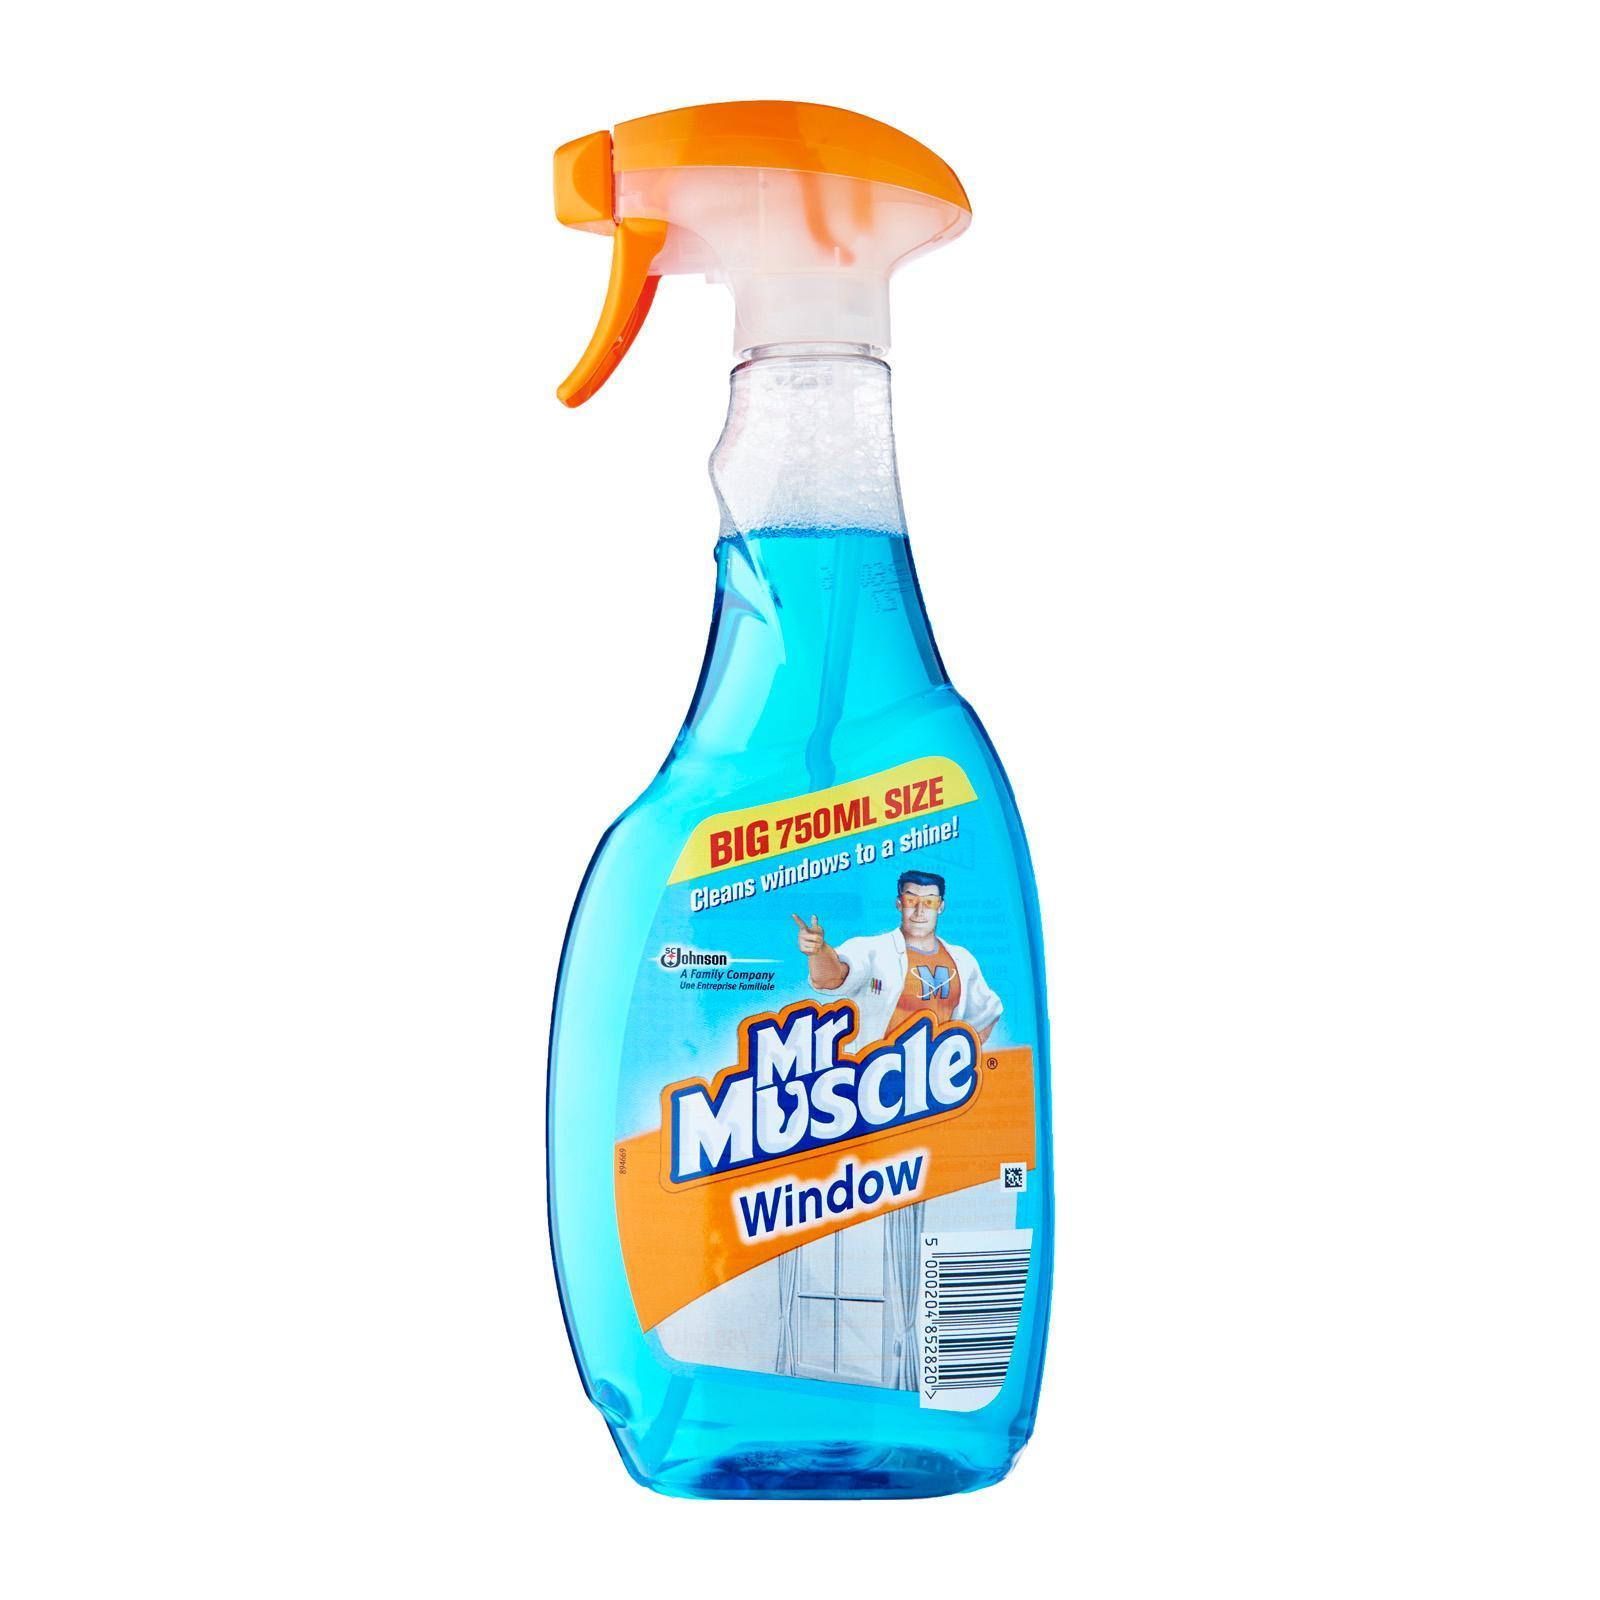 Mr Muscle Advanced Power Window Trigger Spray